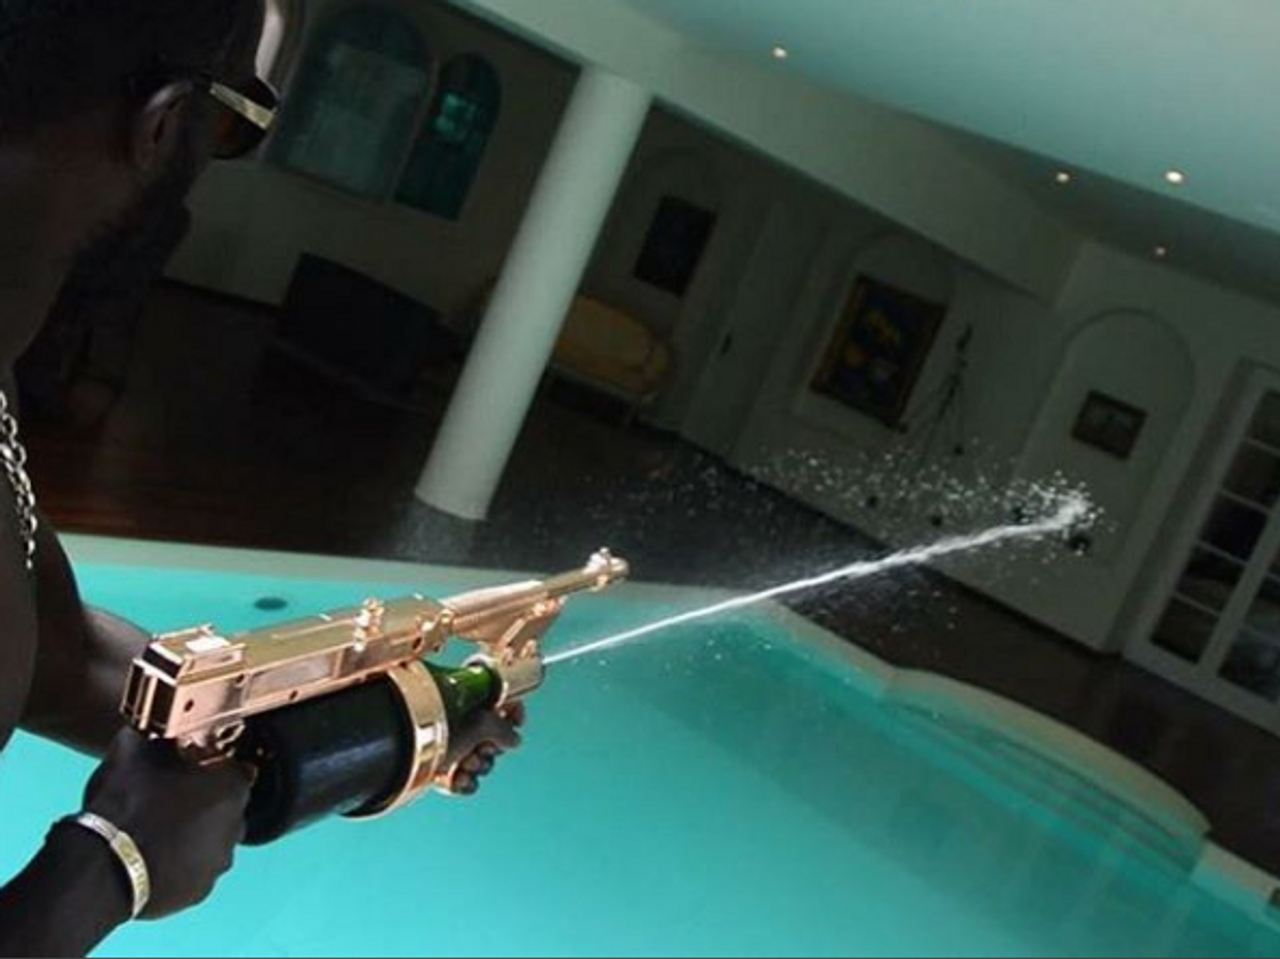 Champagne-Gun-Cannon-Spray-celebrate-party-magnum-Veuvet Cliquot-Dom Perignon-Gun-blast-shoot-